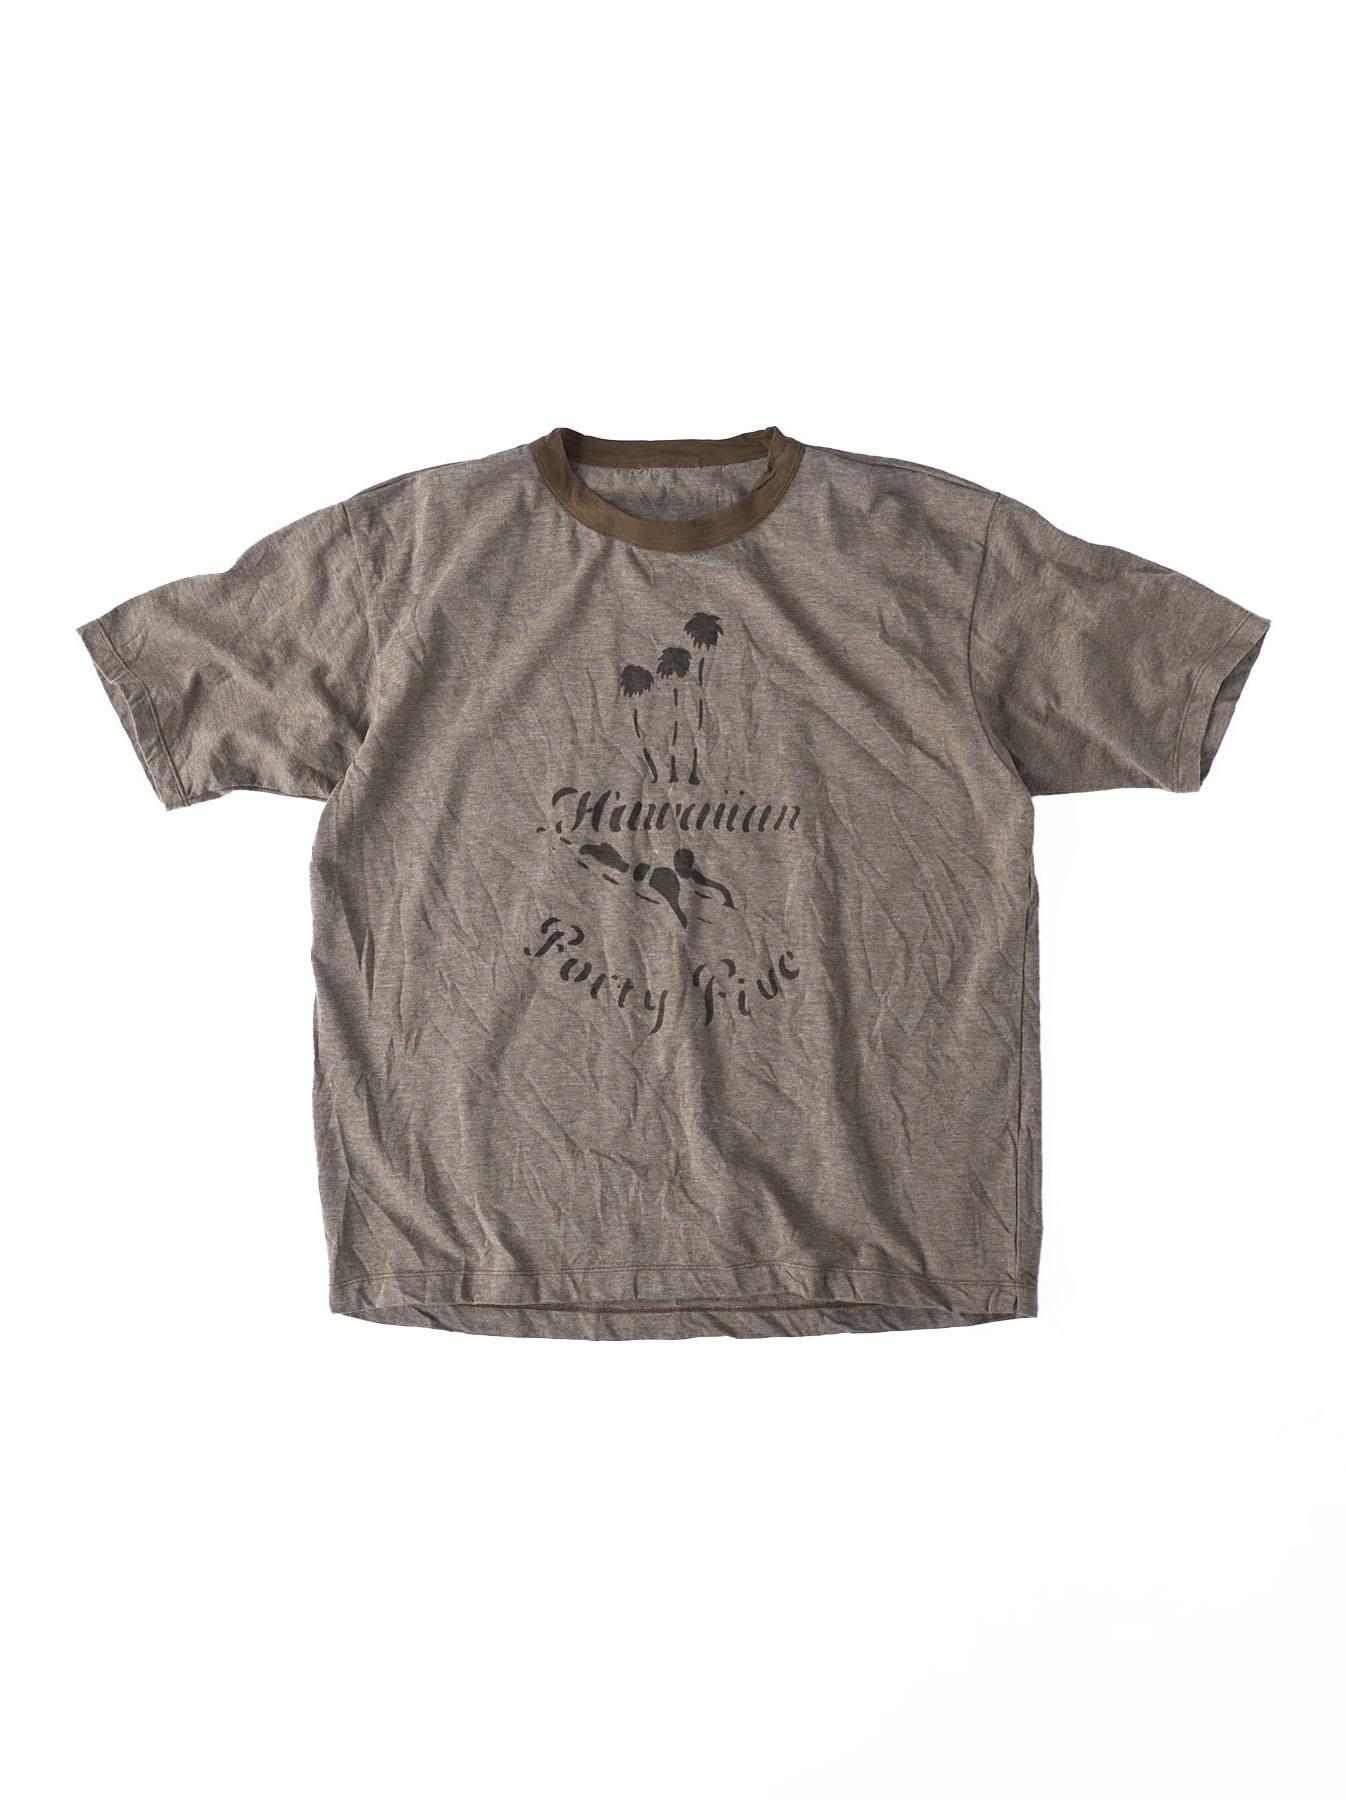 US Tenjiku Paddling 908 Ocean T-Shirt (0521)-3